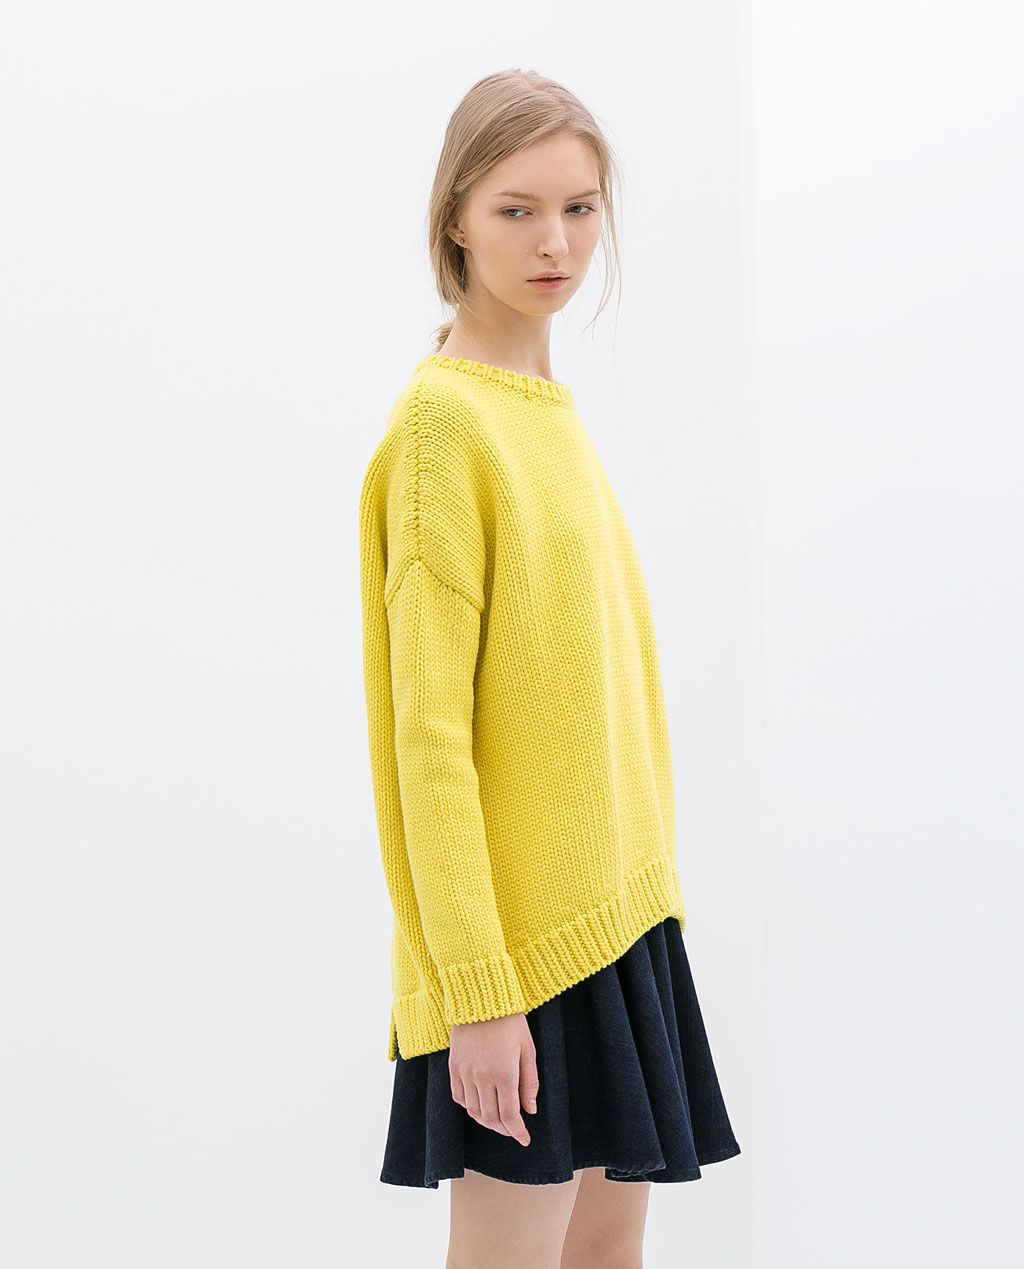 ZARA - WOMAN - OVERSIZE SWEATER | Knitted Garments | Pinterest ...